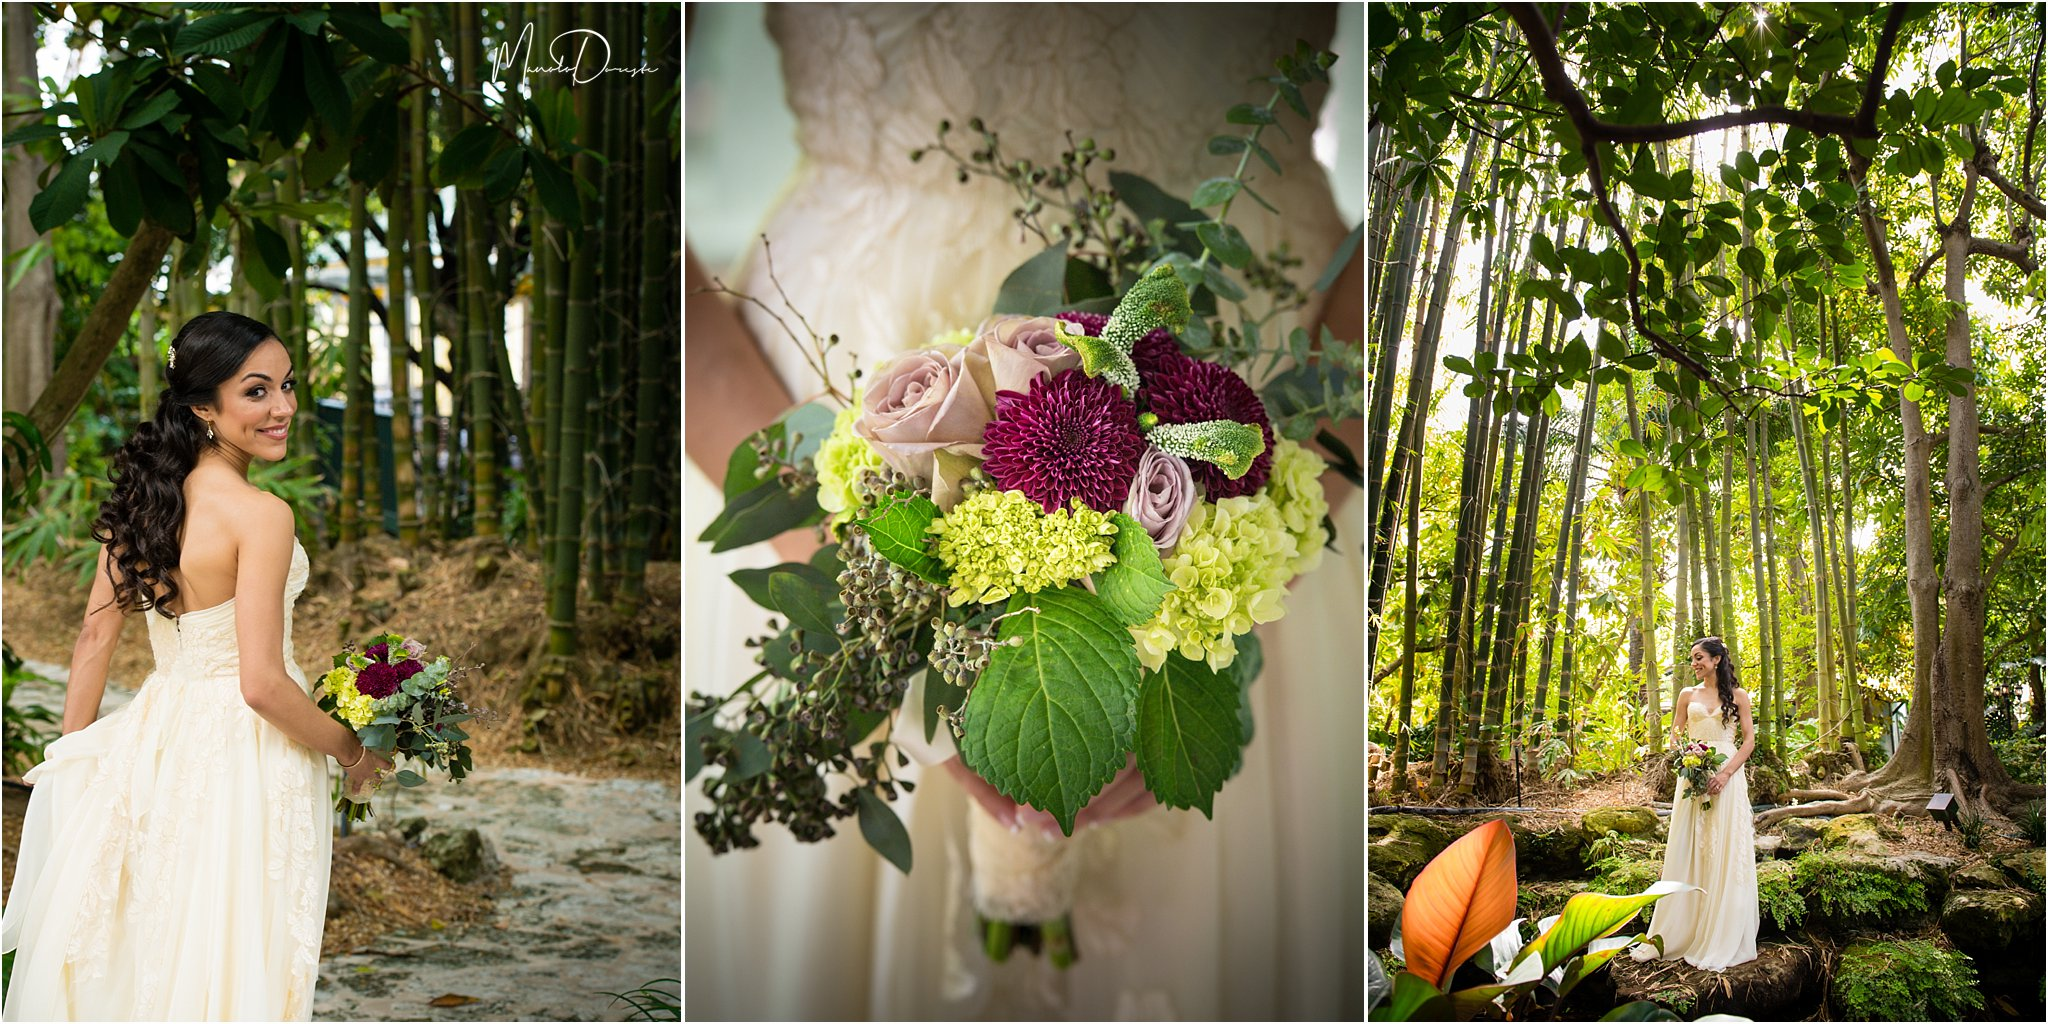 0502_ManoloDoreste_InFocusStudios_Wedding_Family_Photography_Miami_MiamiPhotographer.jpg